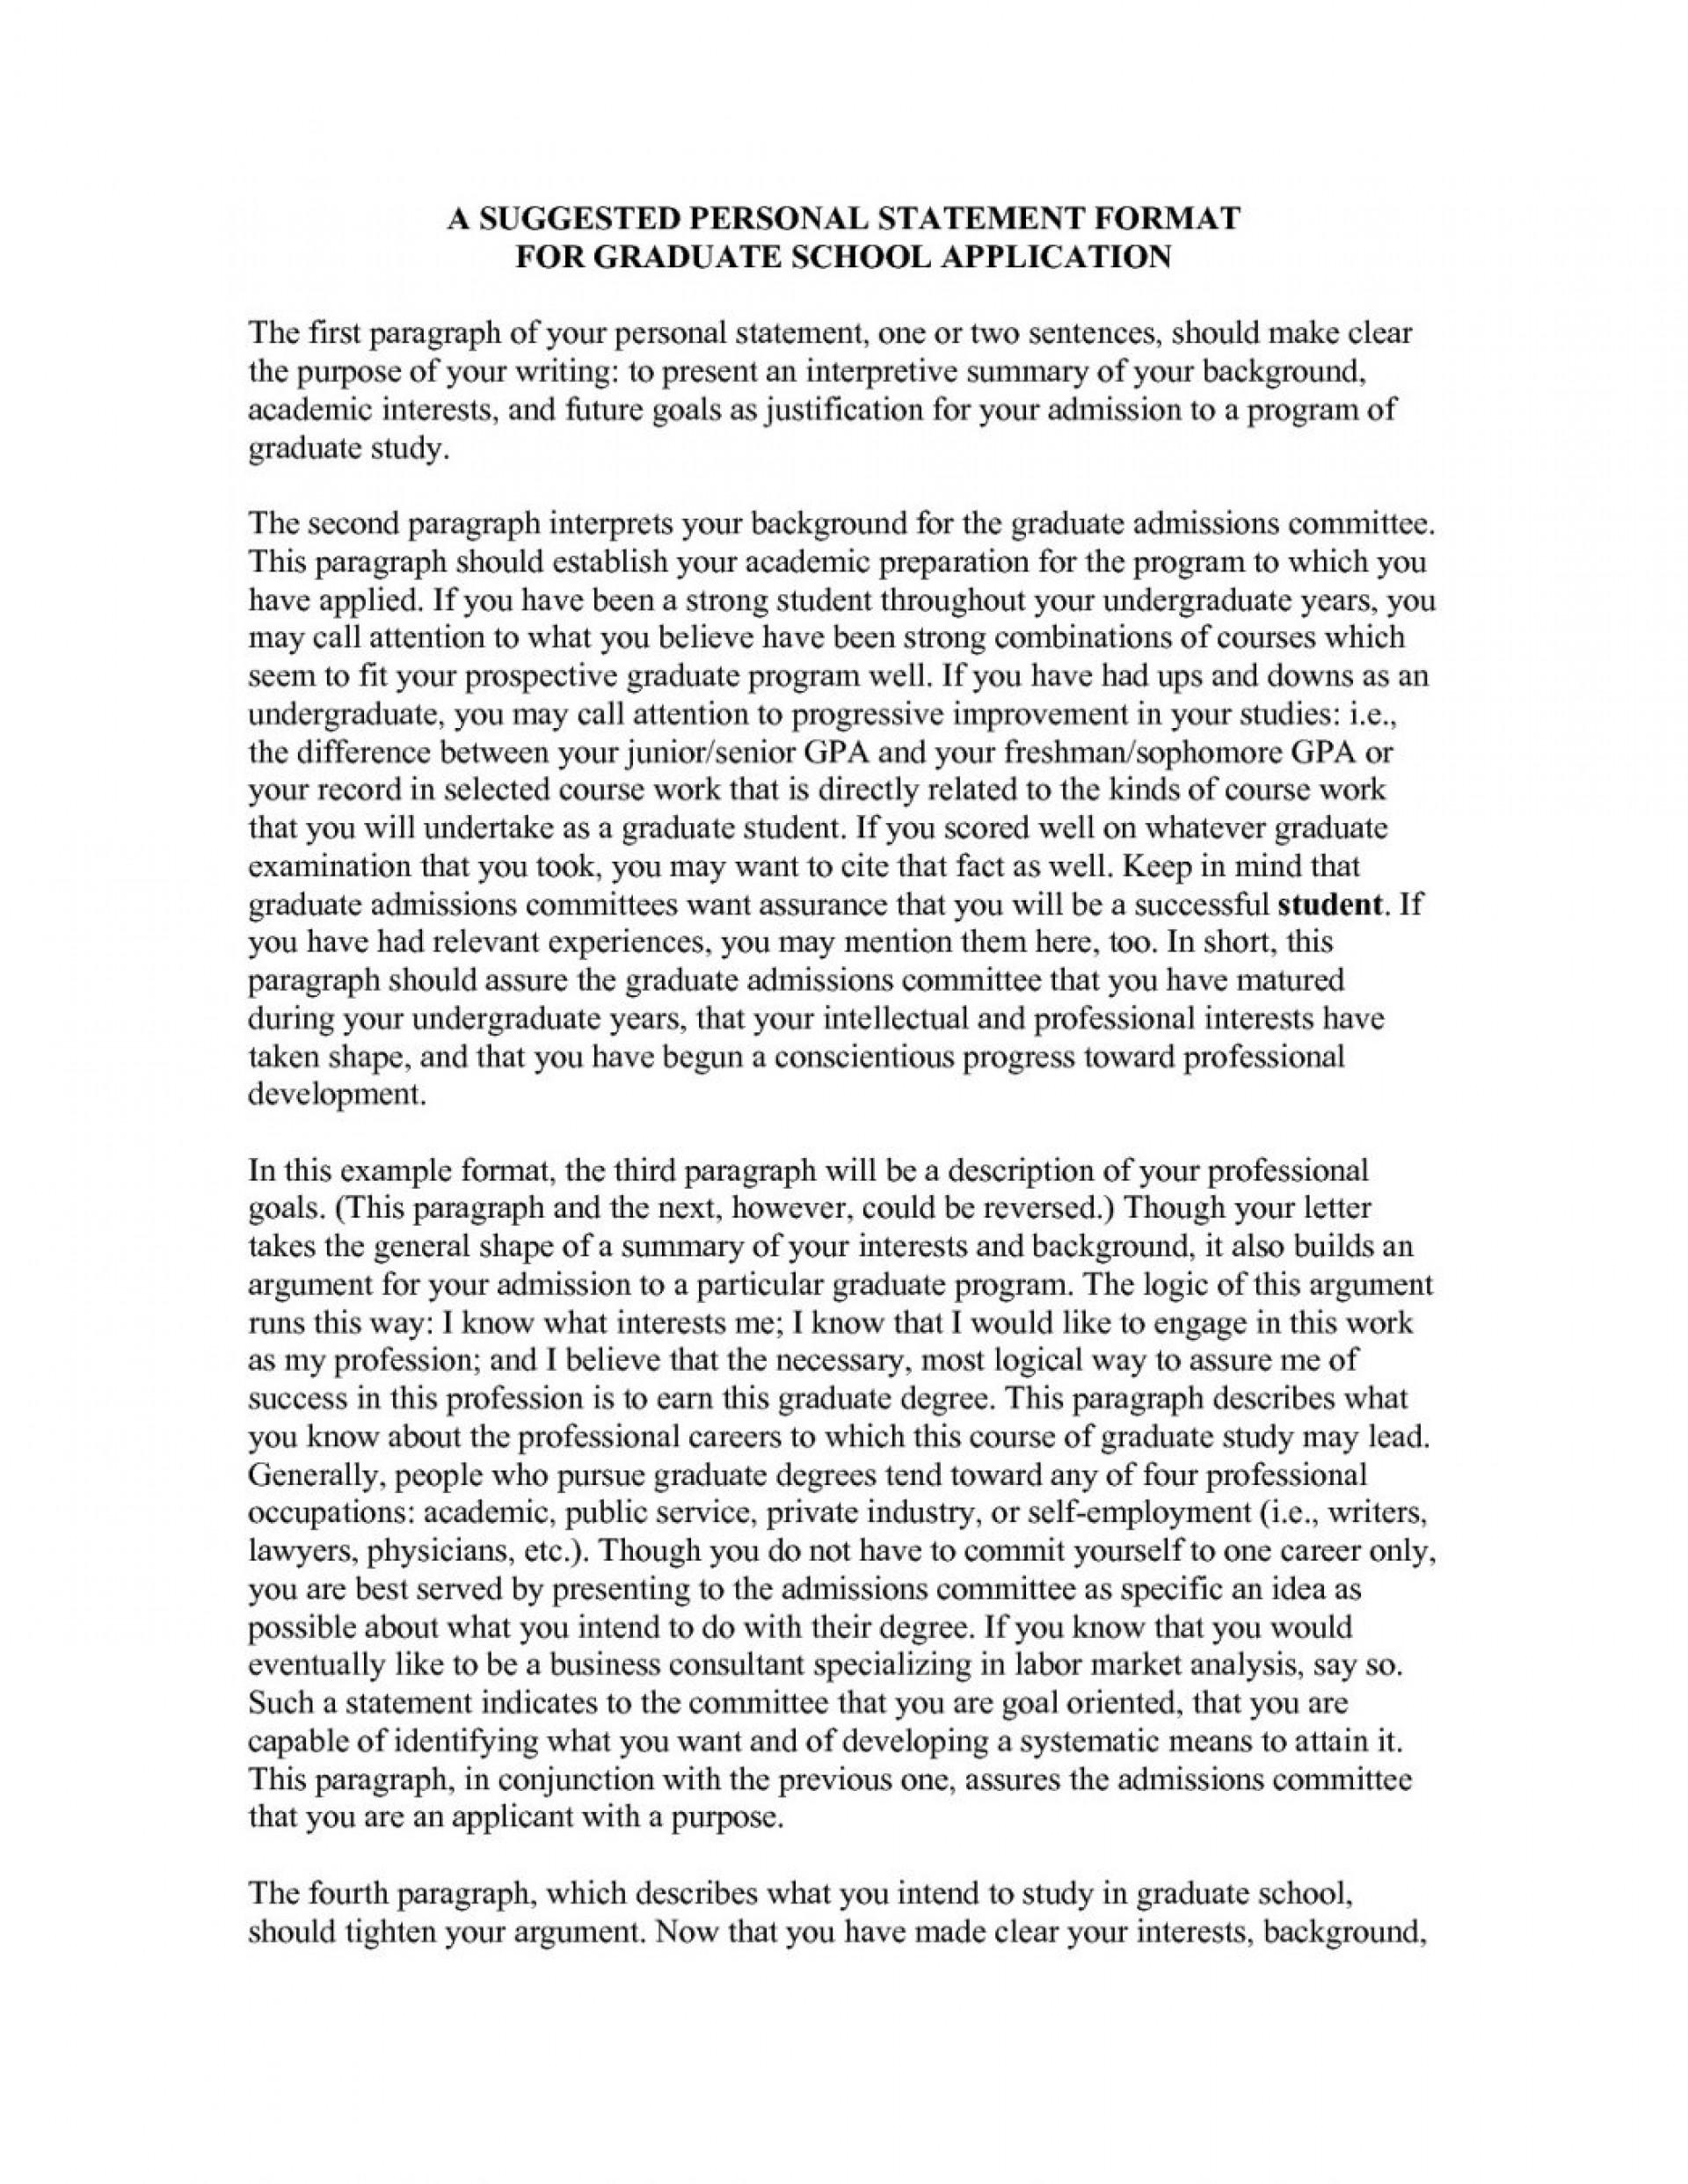 013 Essay Example Sample Interpretive New Happy Birthday Kenom Brady Resume Vegetaful Com Response Luxury Of Creative Writing Inven 5th Grade Paper Examples College Impressive 1920